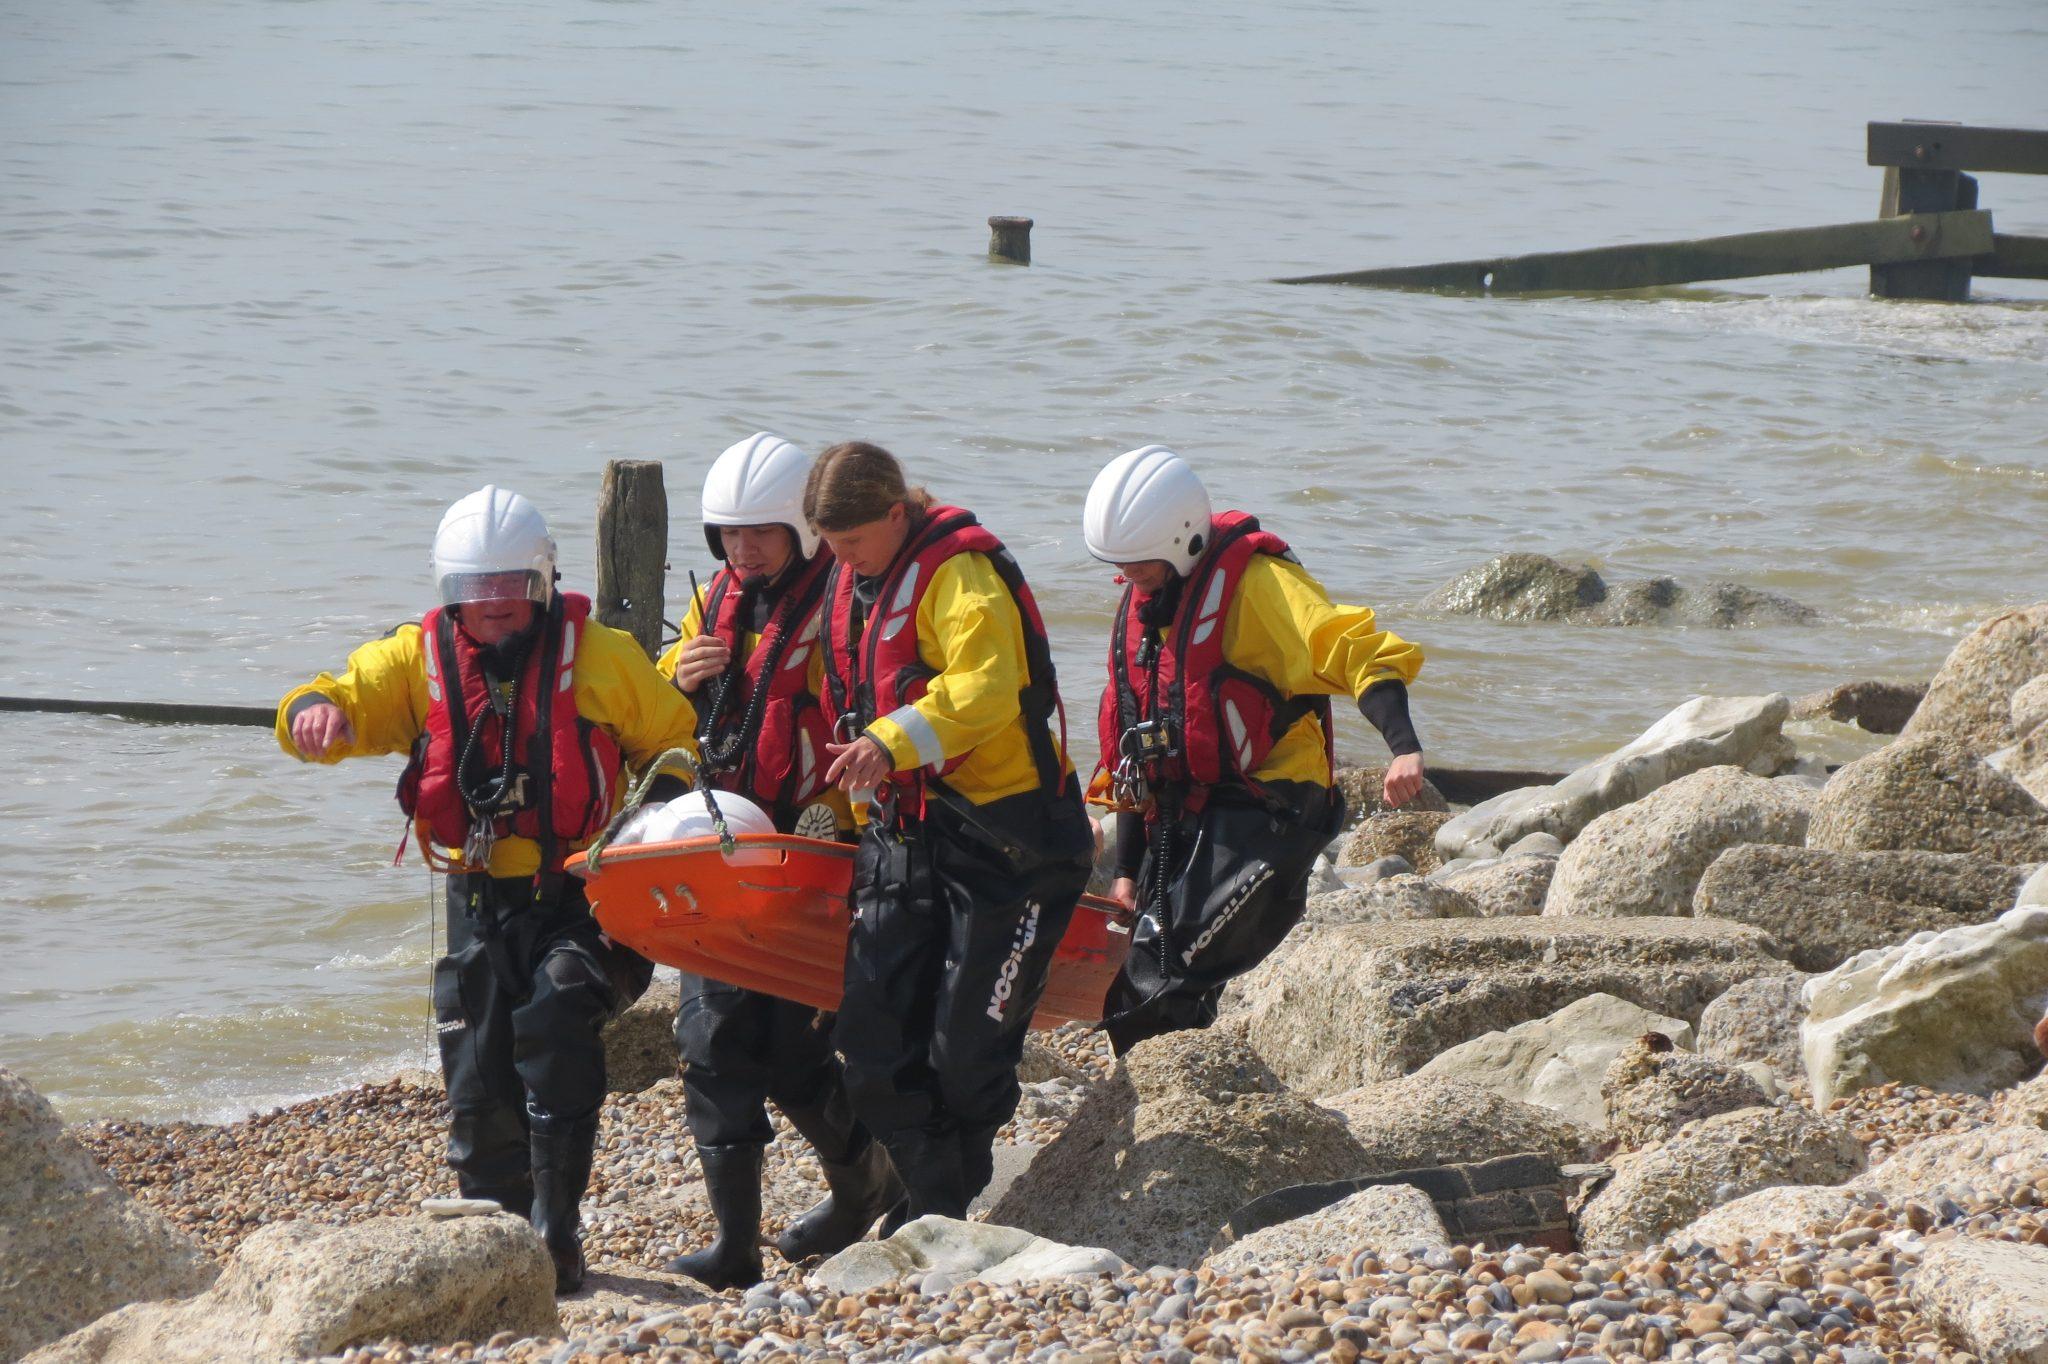 Casualty Retrieval Training #3